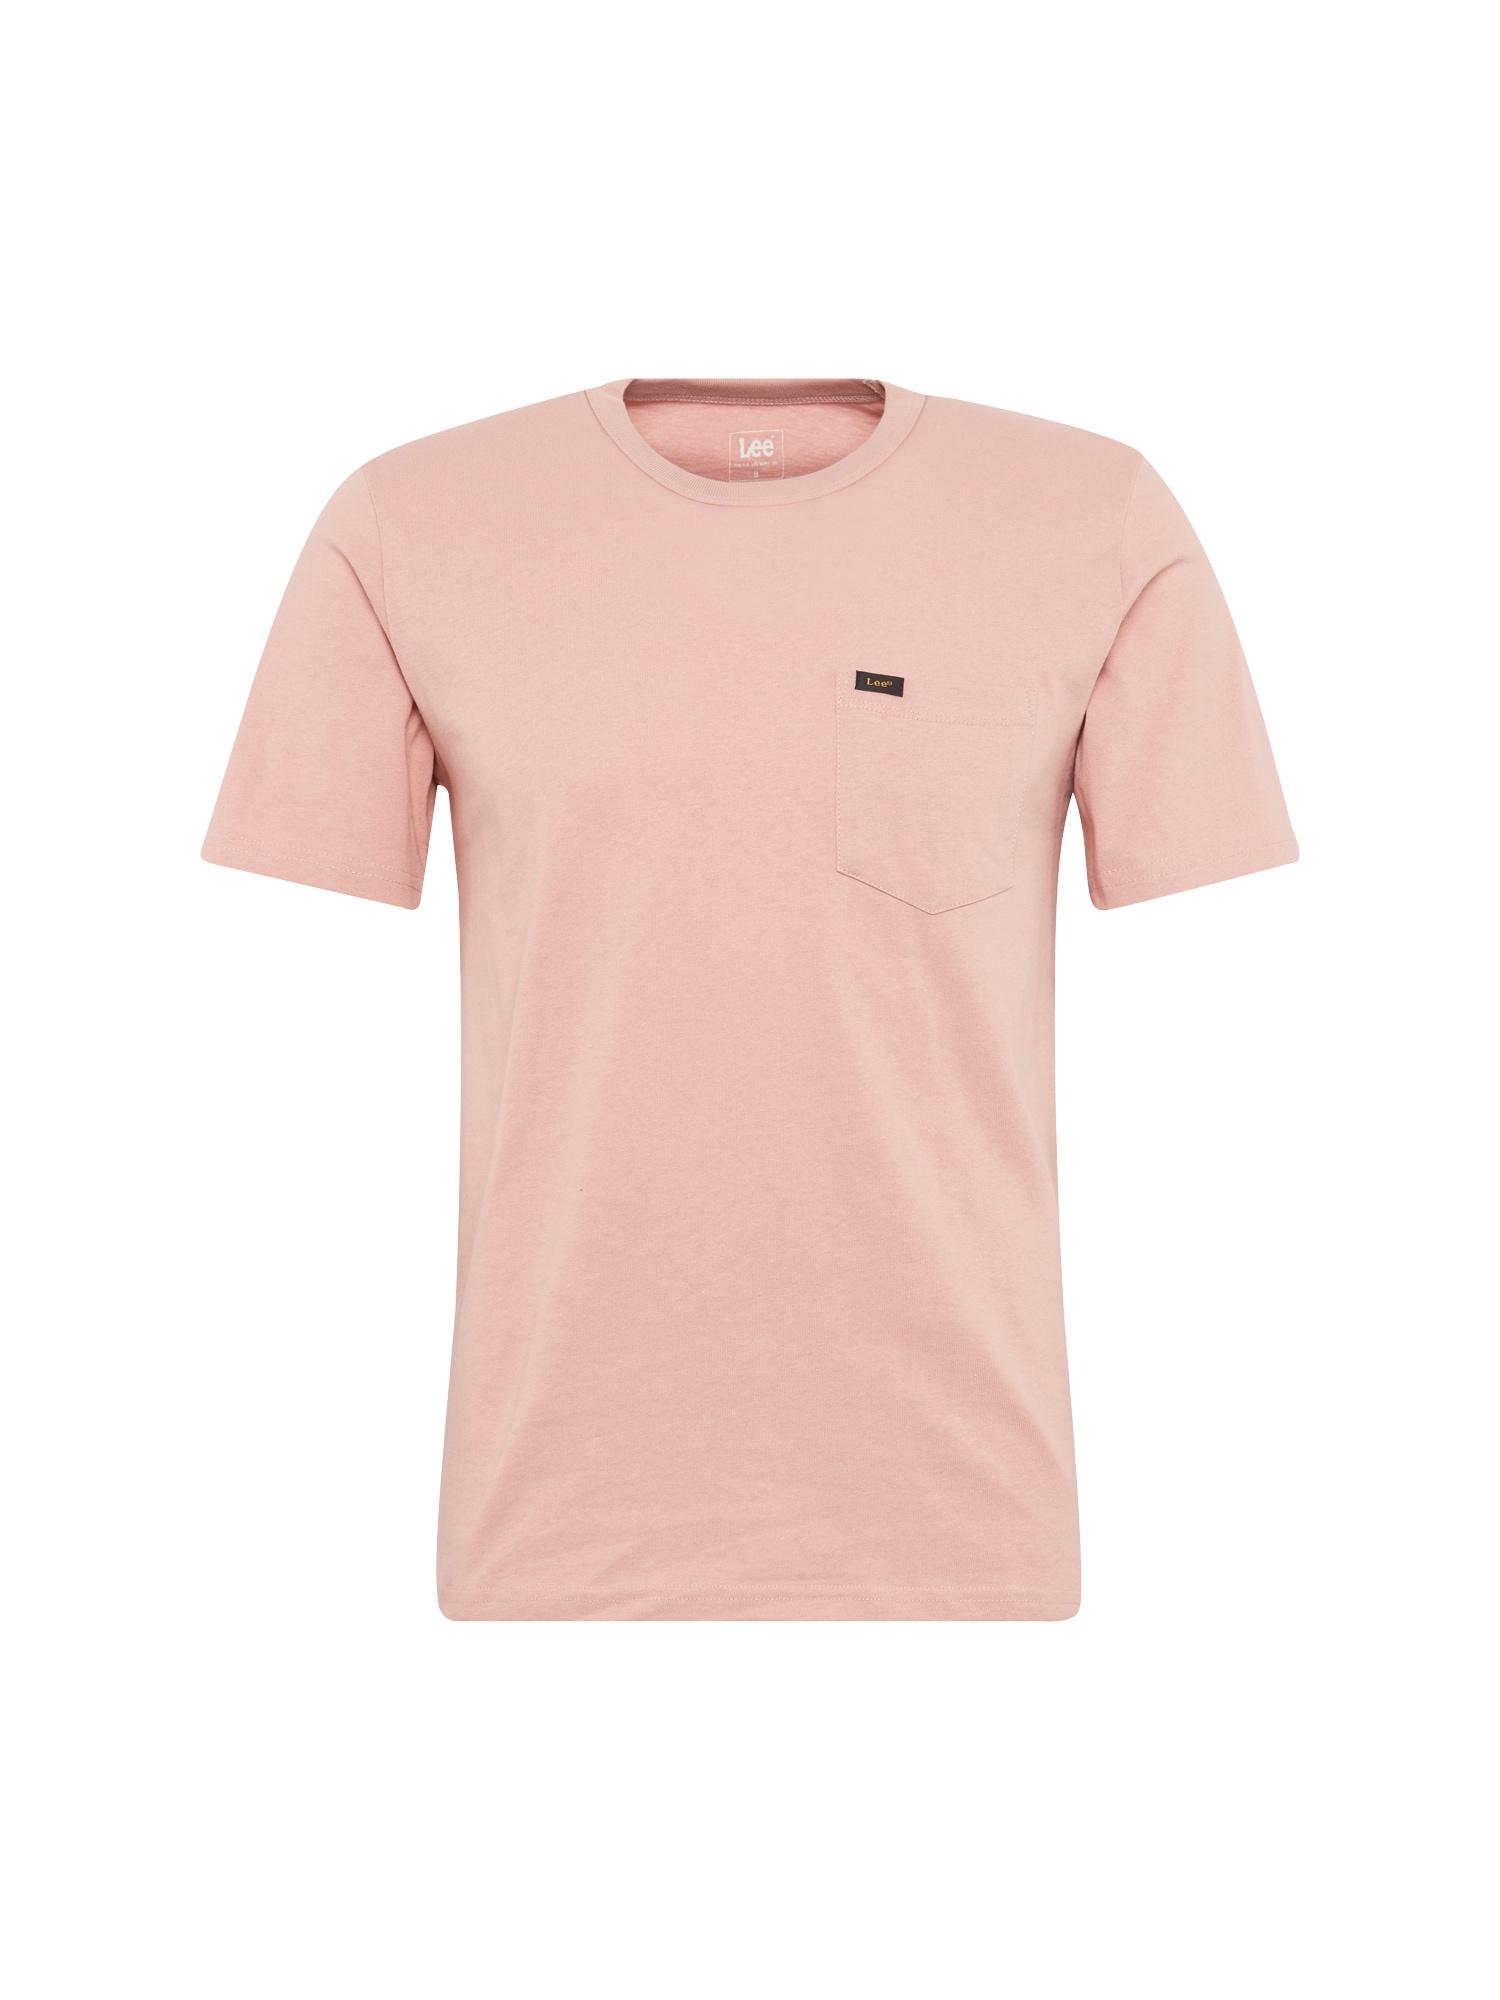 Lee Heren Shirt POCKET rosa